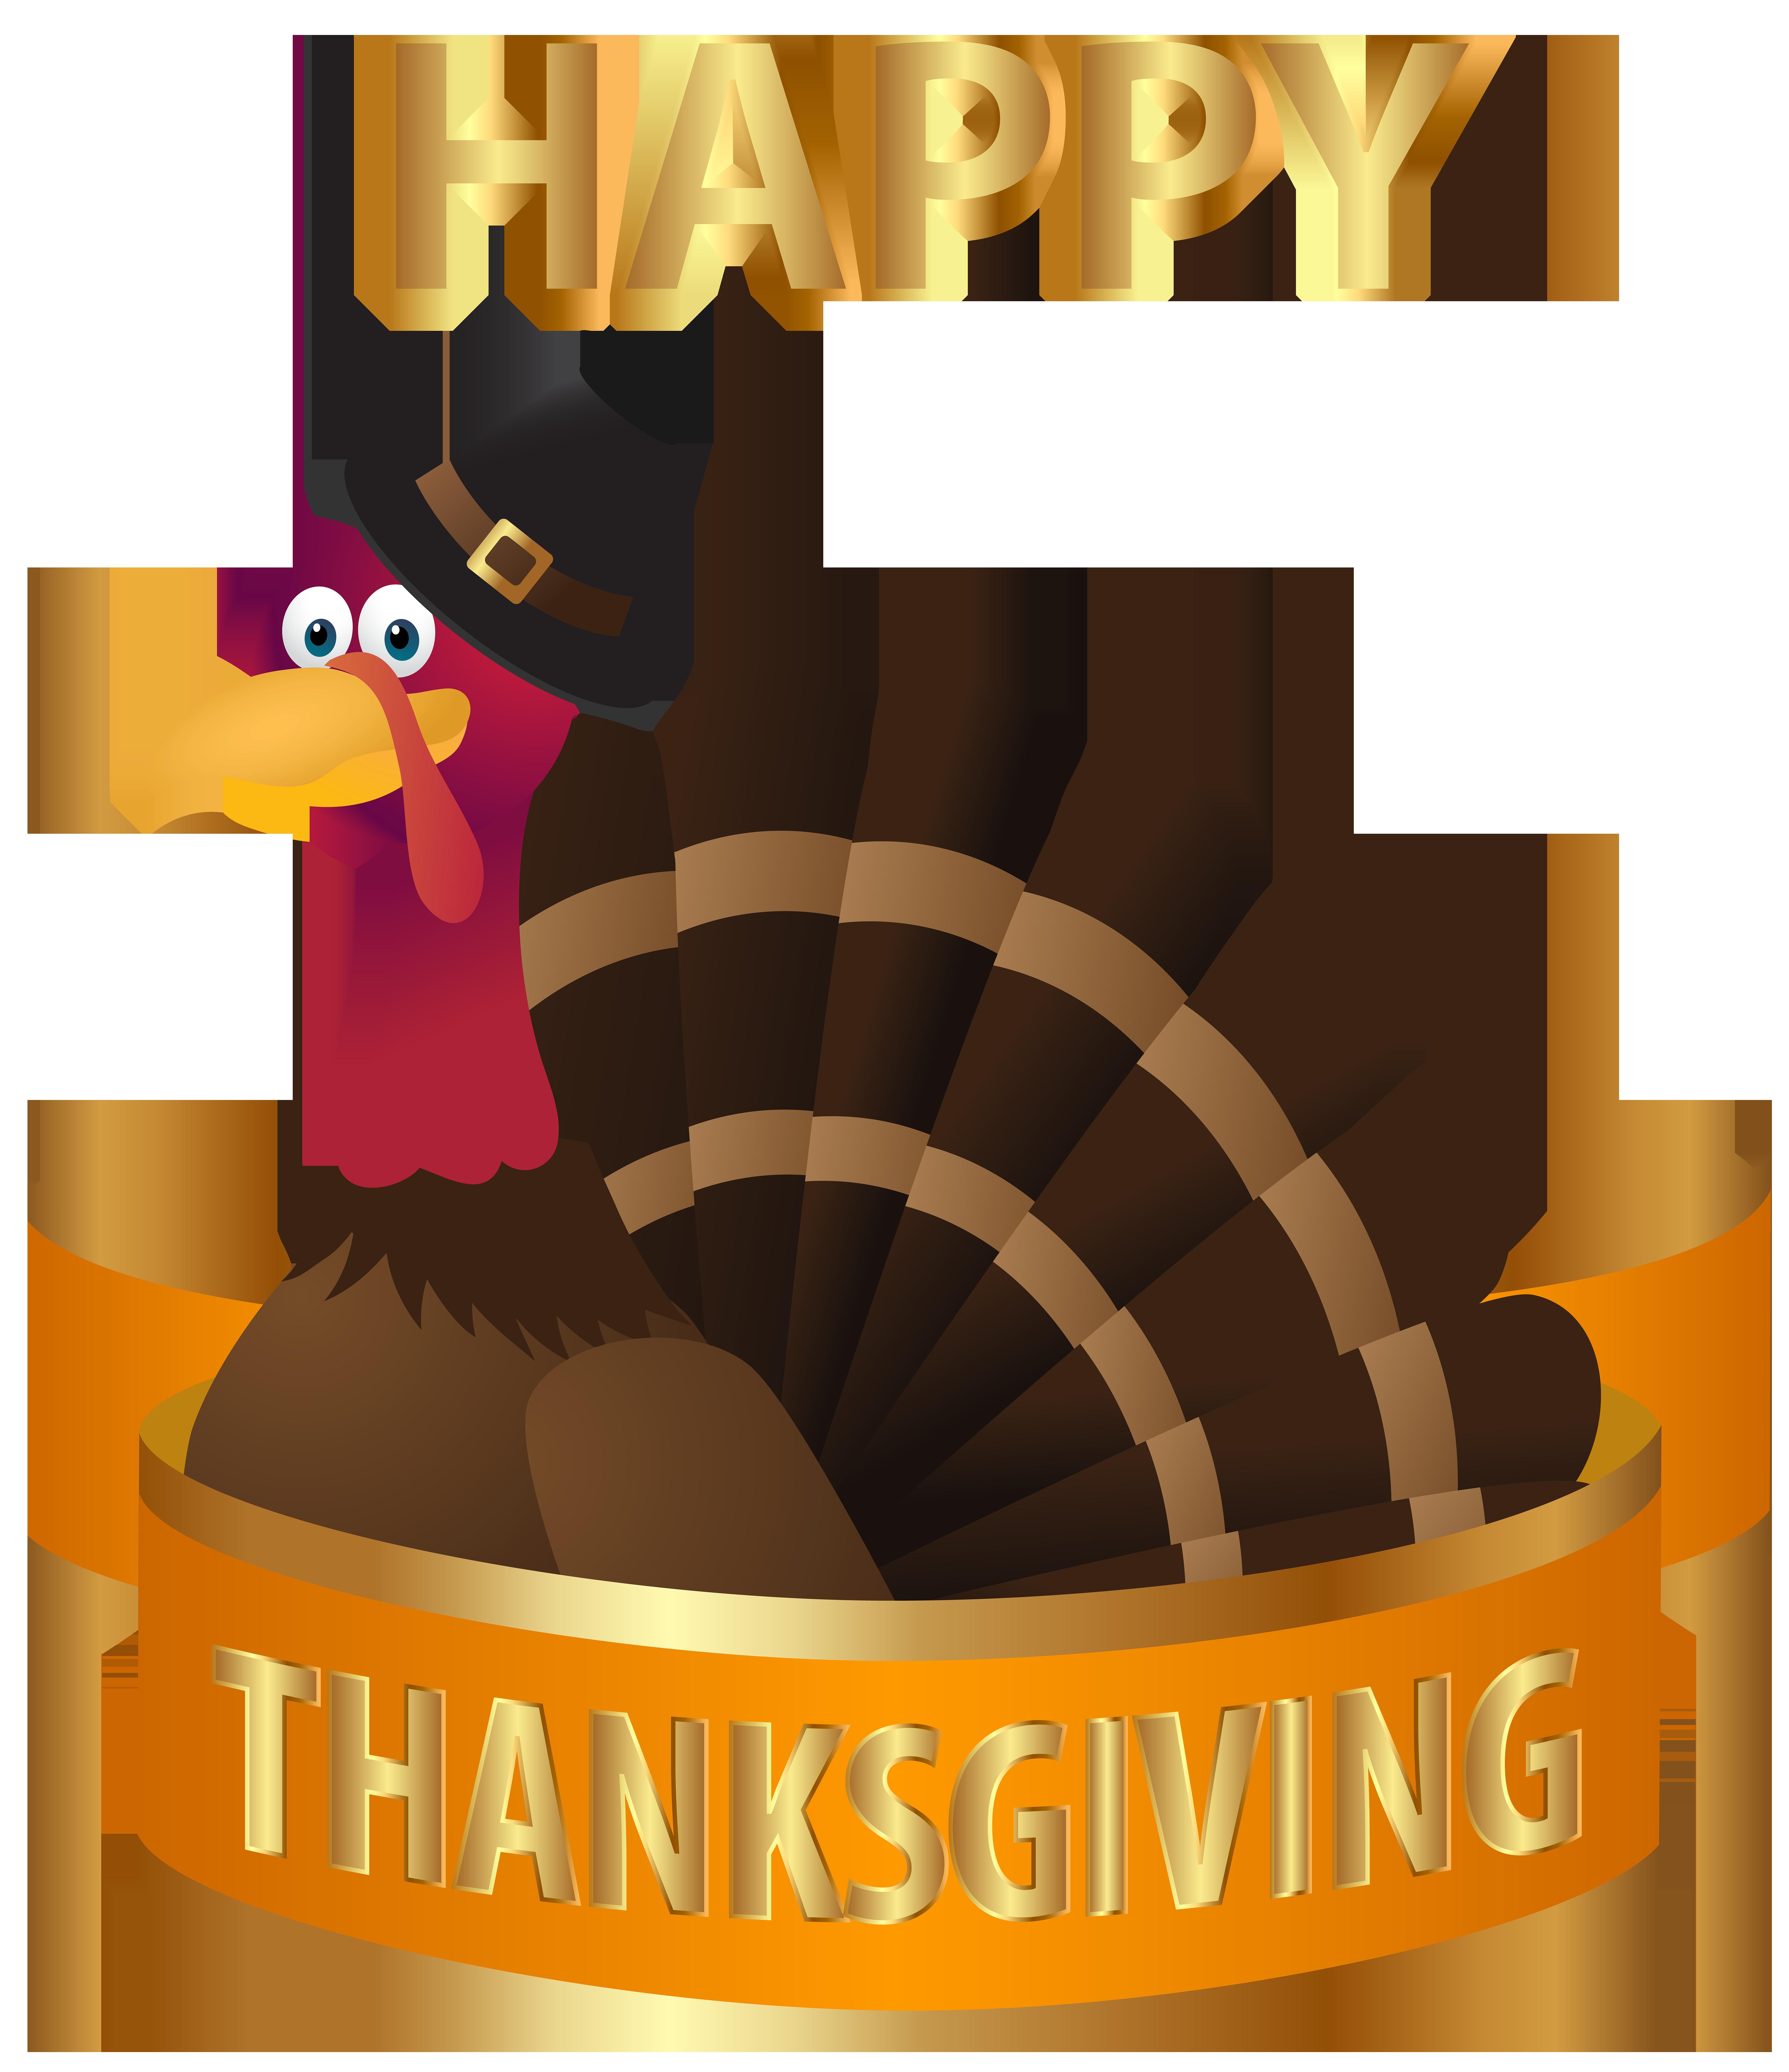 Happy Thanksgiving Turkey Transparent PNG Image.